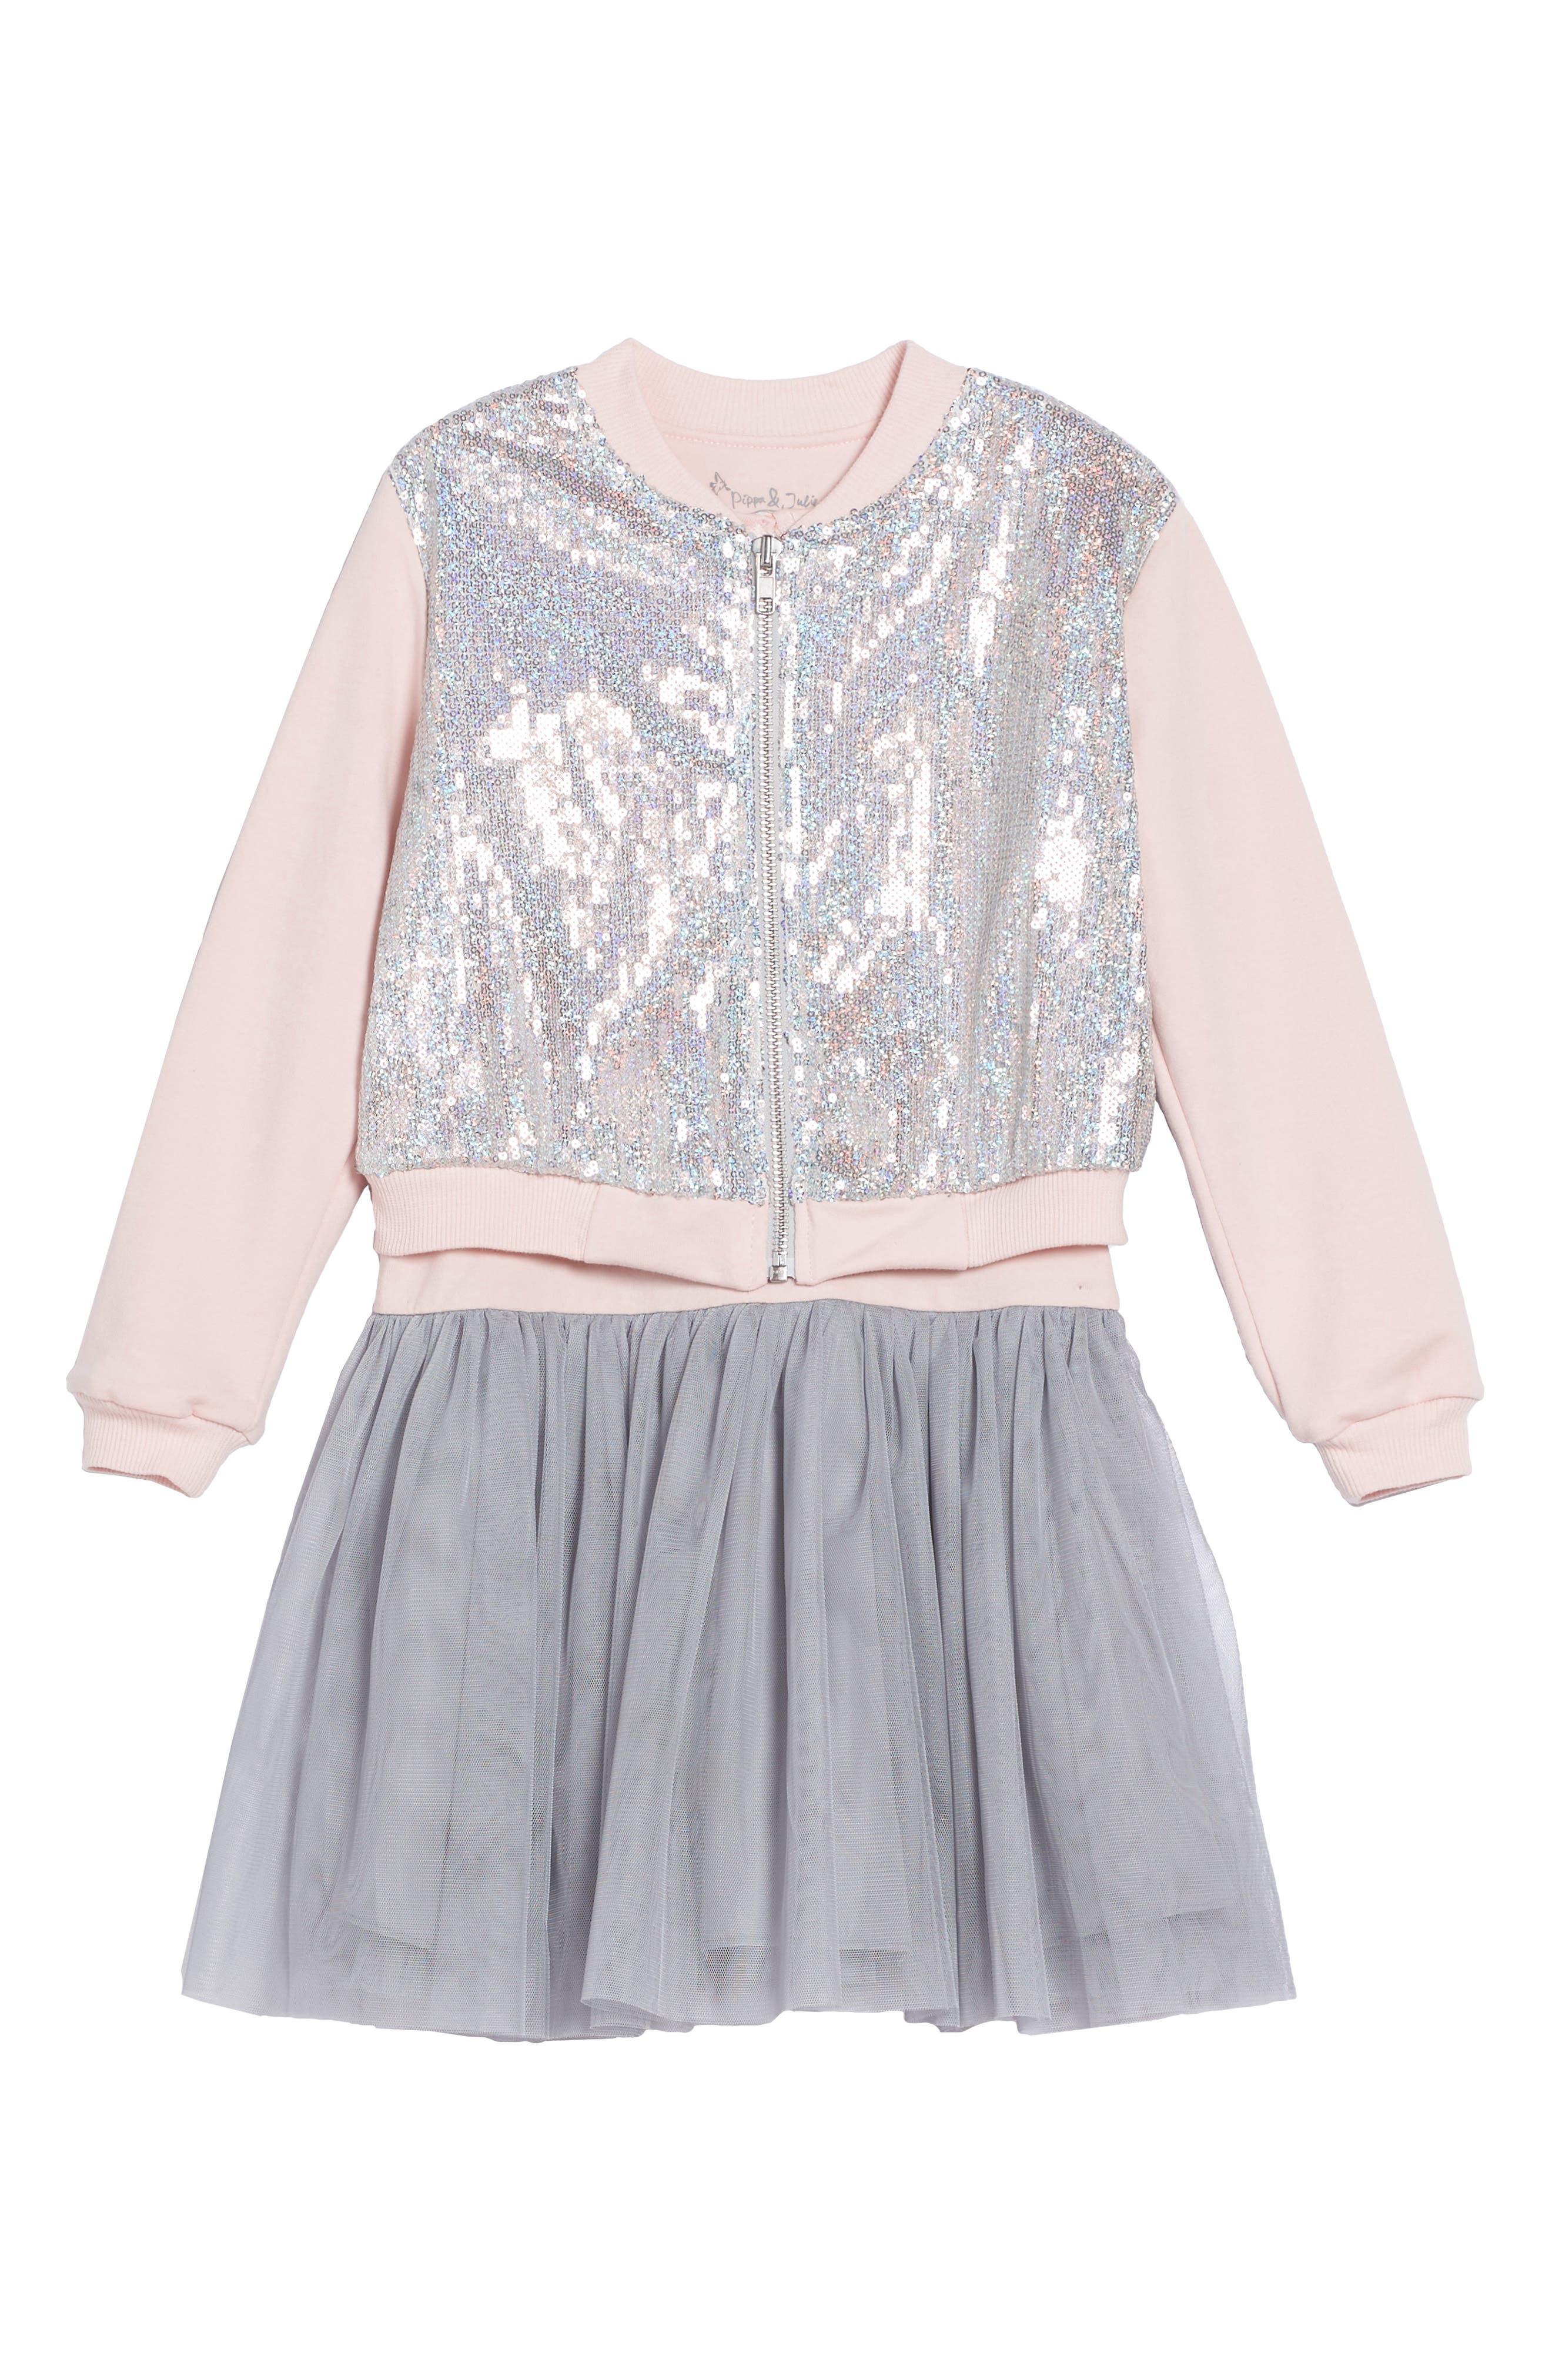 Tank Dress & Sequin Bomber Jacket Set,                             Main thumbnail 1, color,                             Silver/ Pink